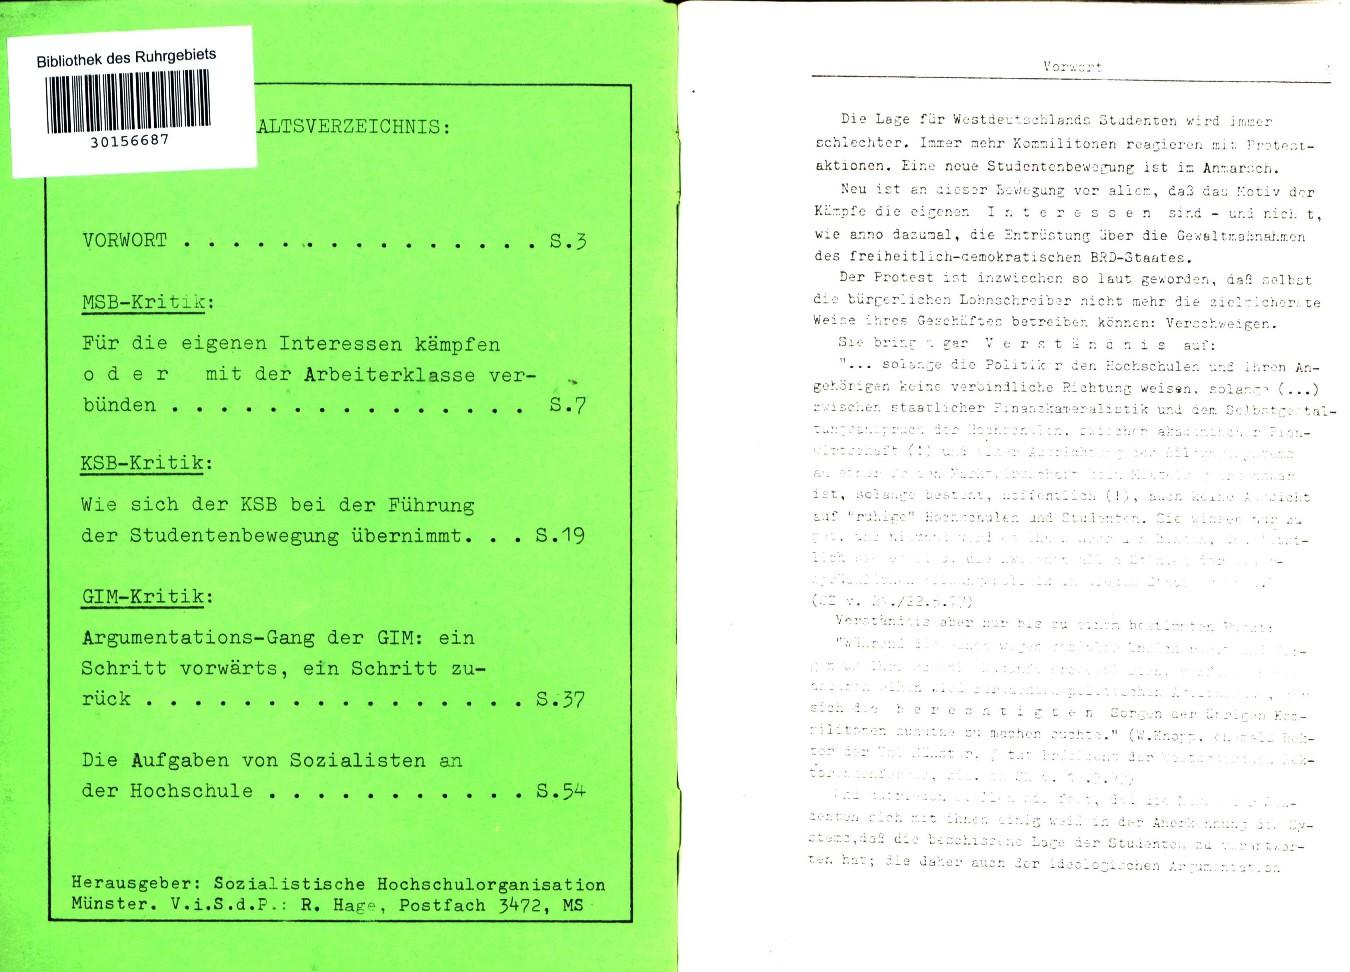 Muenster_SHO_1977_Studenteninteressen_02